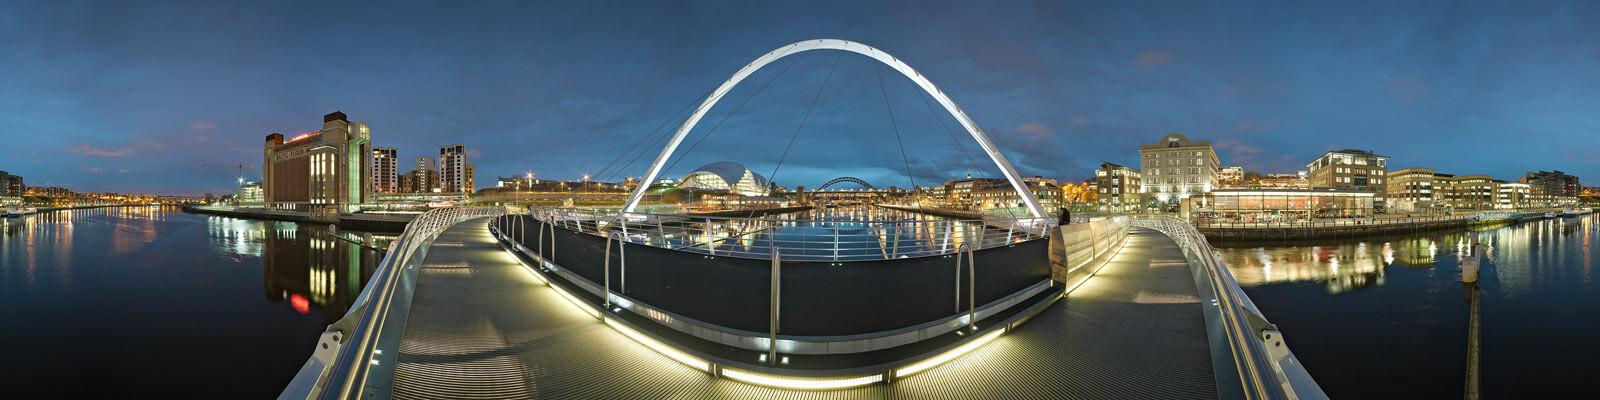 Newcastle, Gateshead Millenium Bridge - Josh Von Staudach